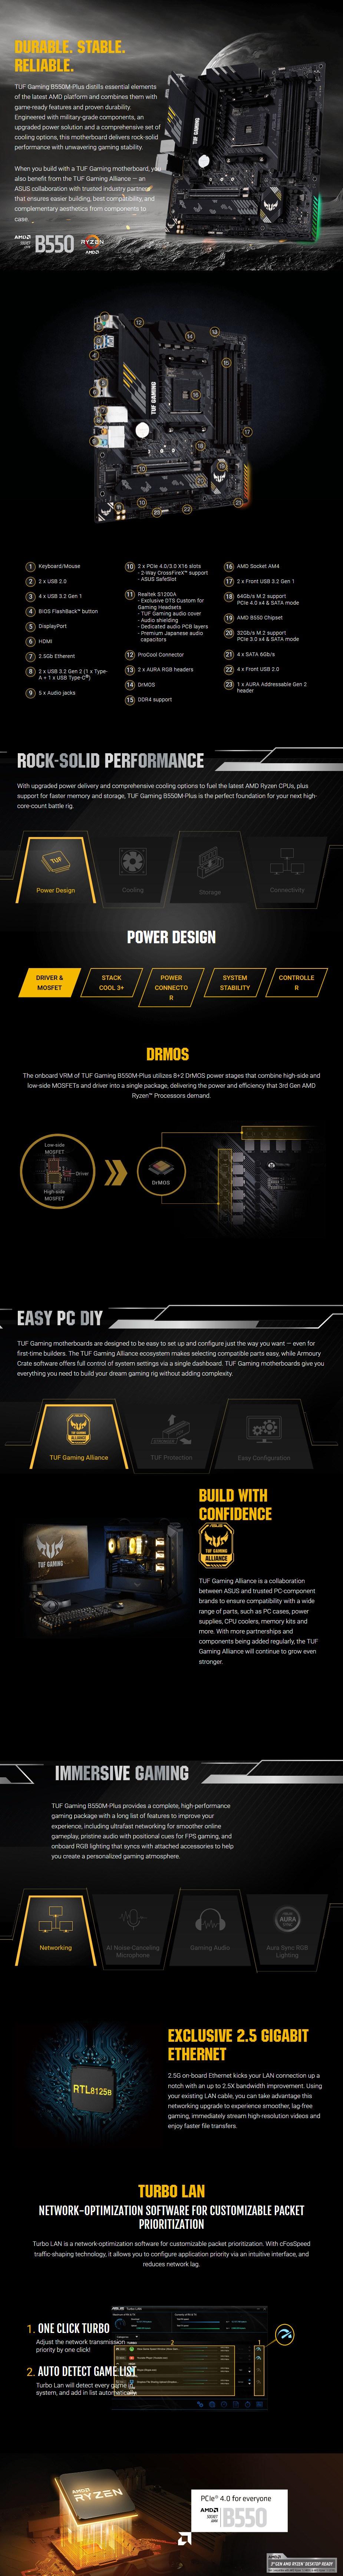 asus-tuf-gaming-b550mplus-am4-microatx-motherboard-ac35549-8.jpg